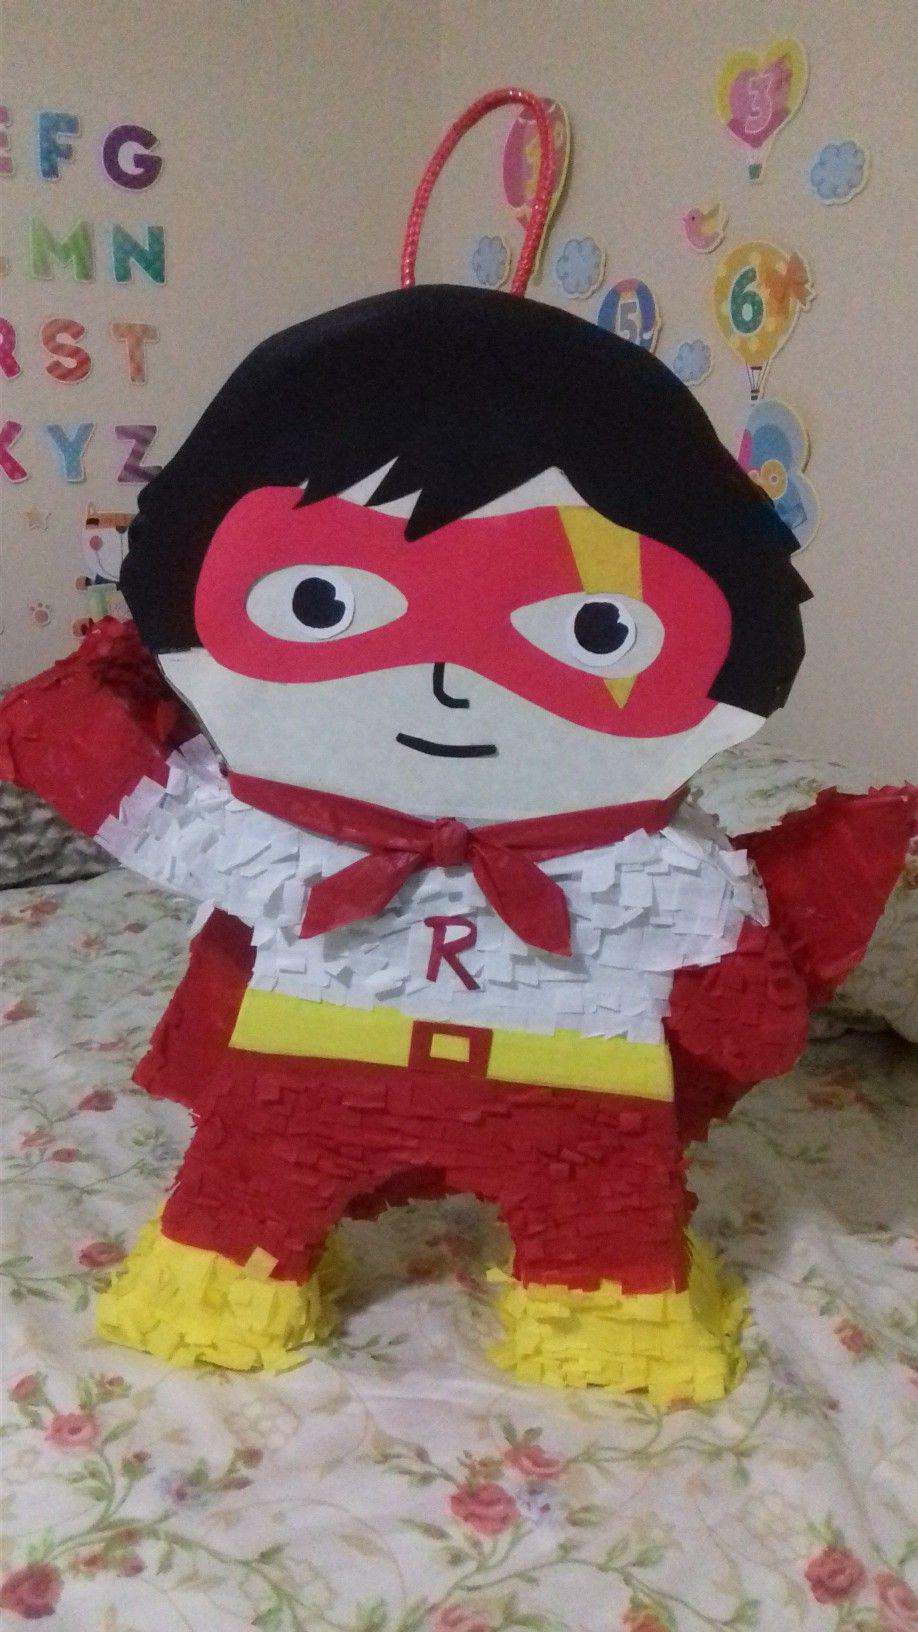 Pin By Desiree On Ryan S World Red Titan Pinata Ryan Toys Kids Birthday Boy Birthday